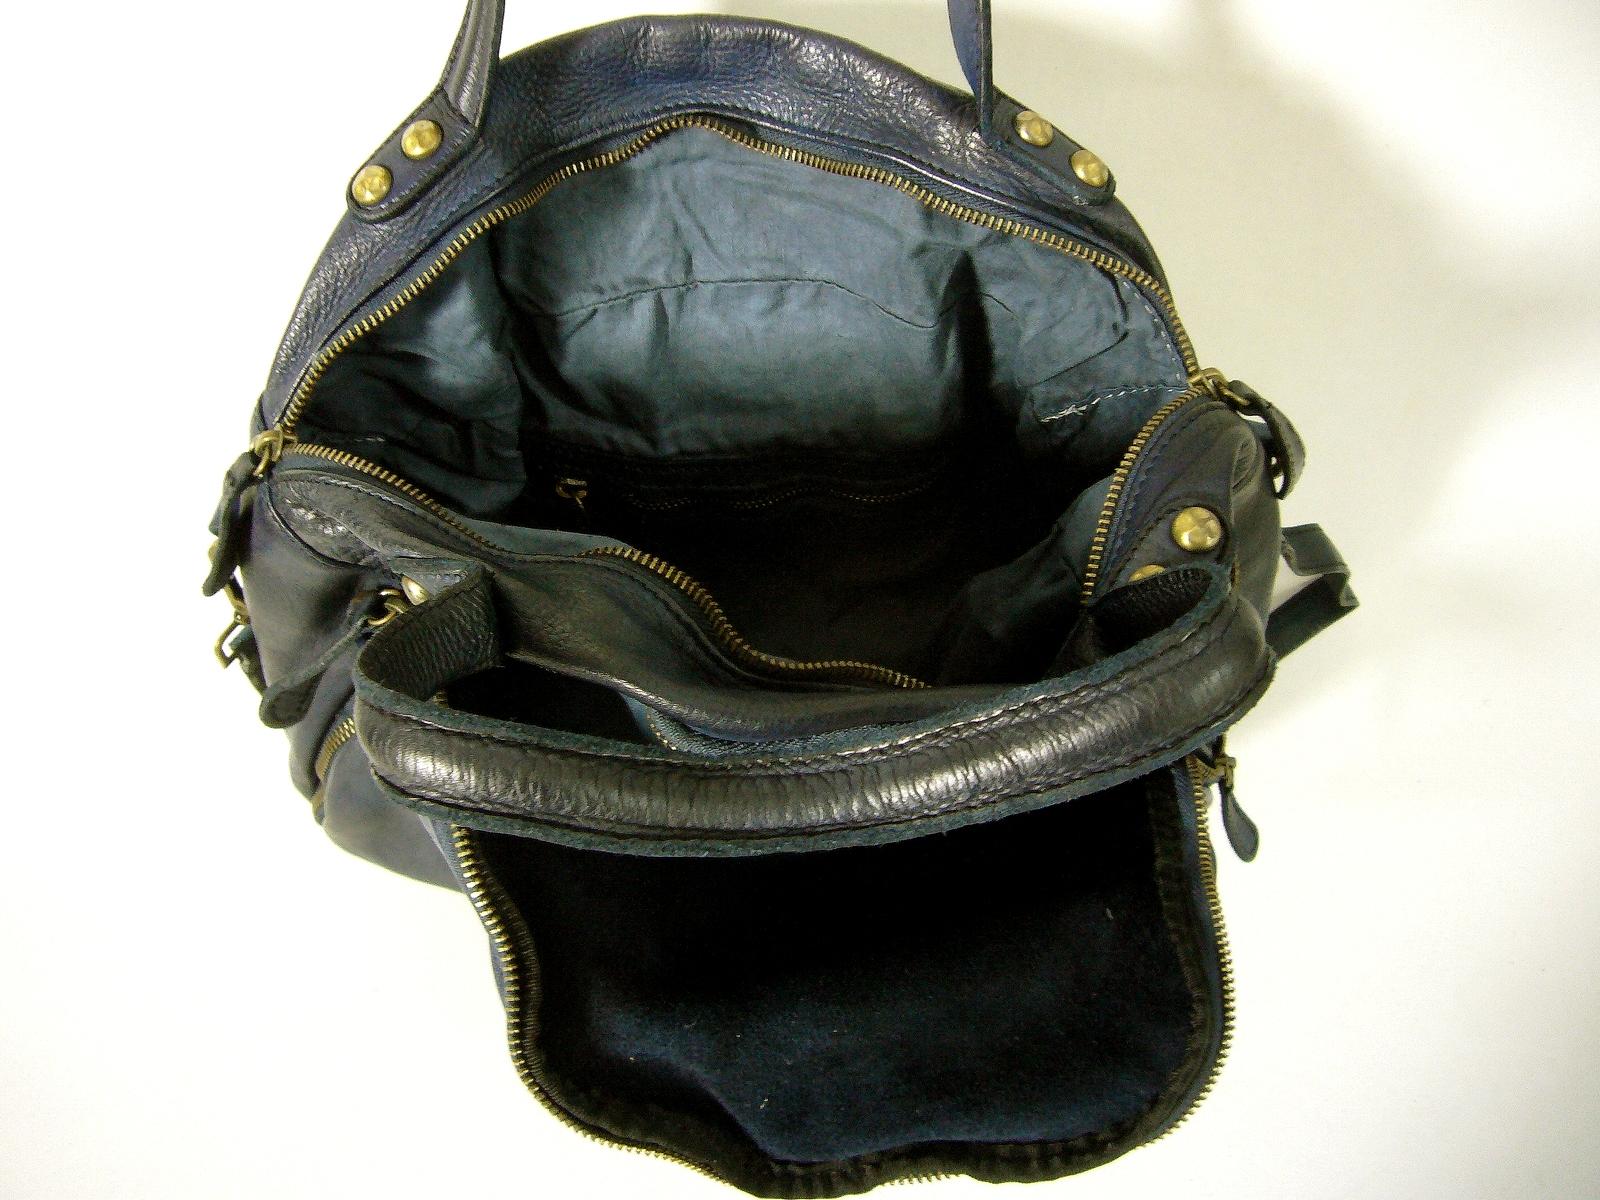 d4dbeb61be Sac a main cuir vintage bleu marine Sandra de Collection Esprit Cuir